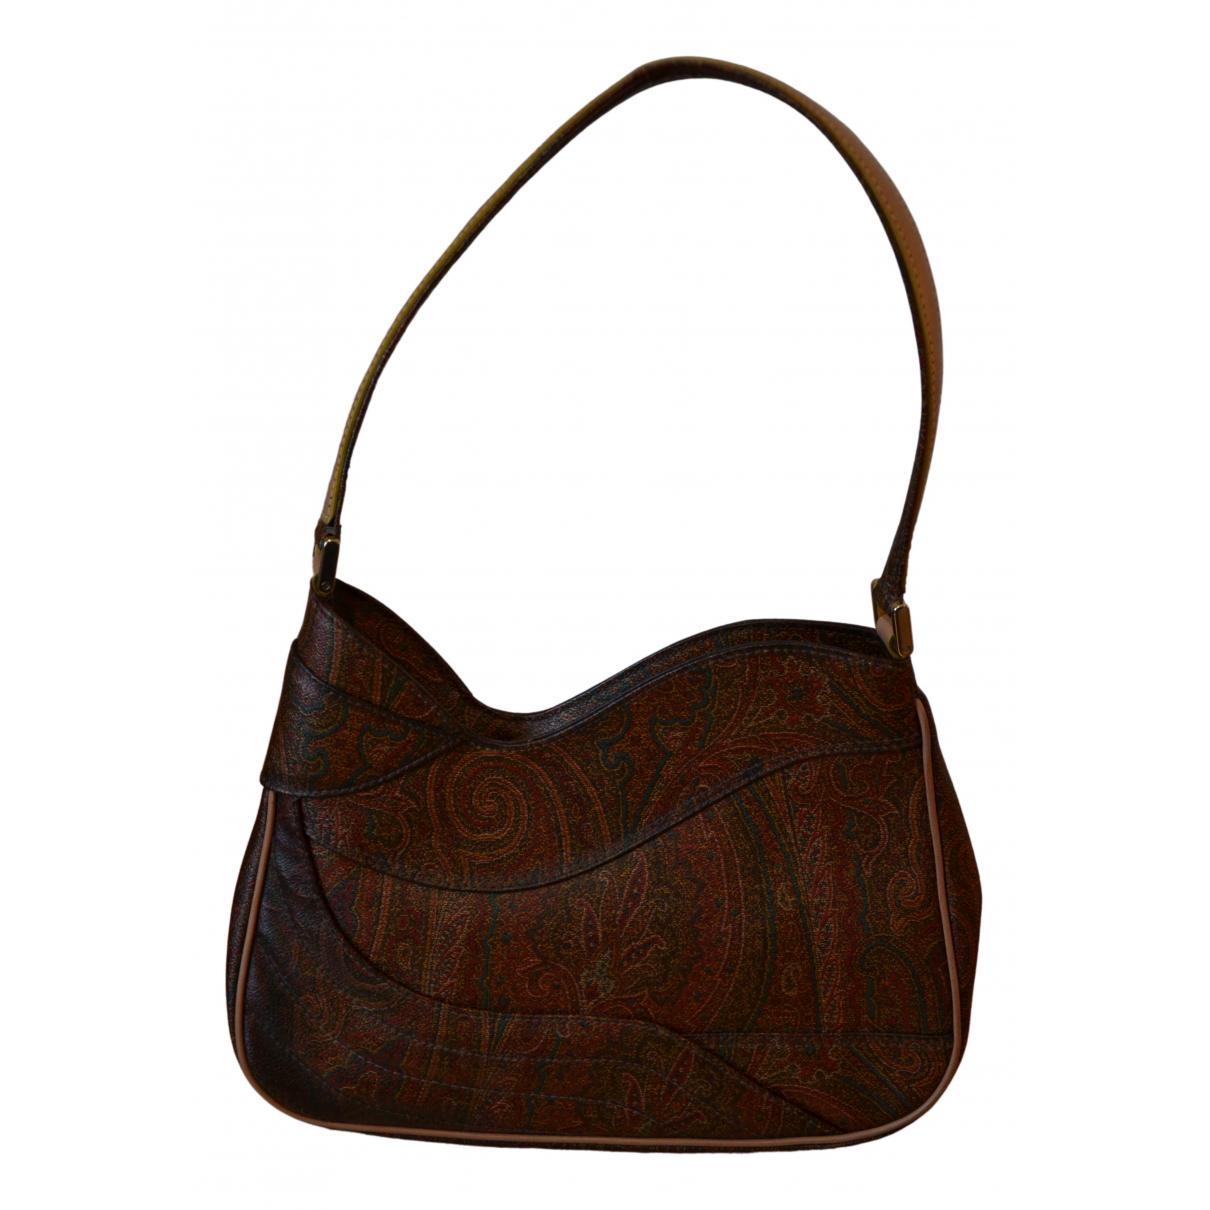 Etro N Brown Leather handbag for Women N